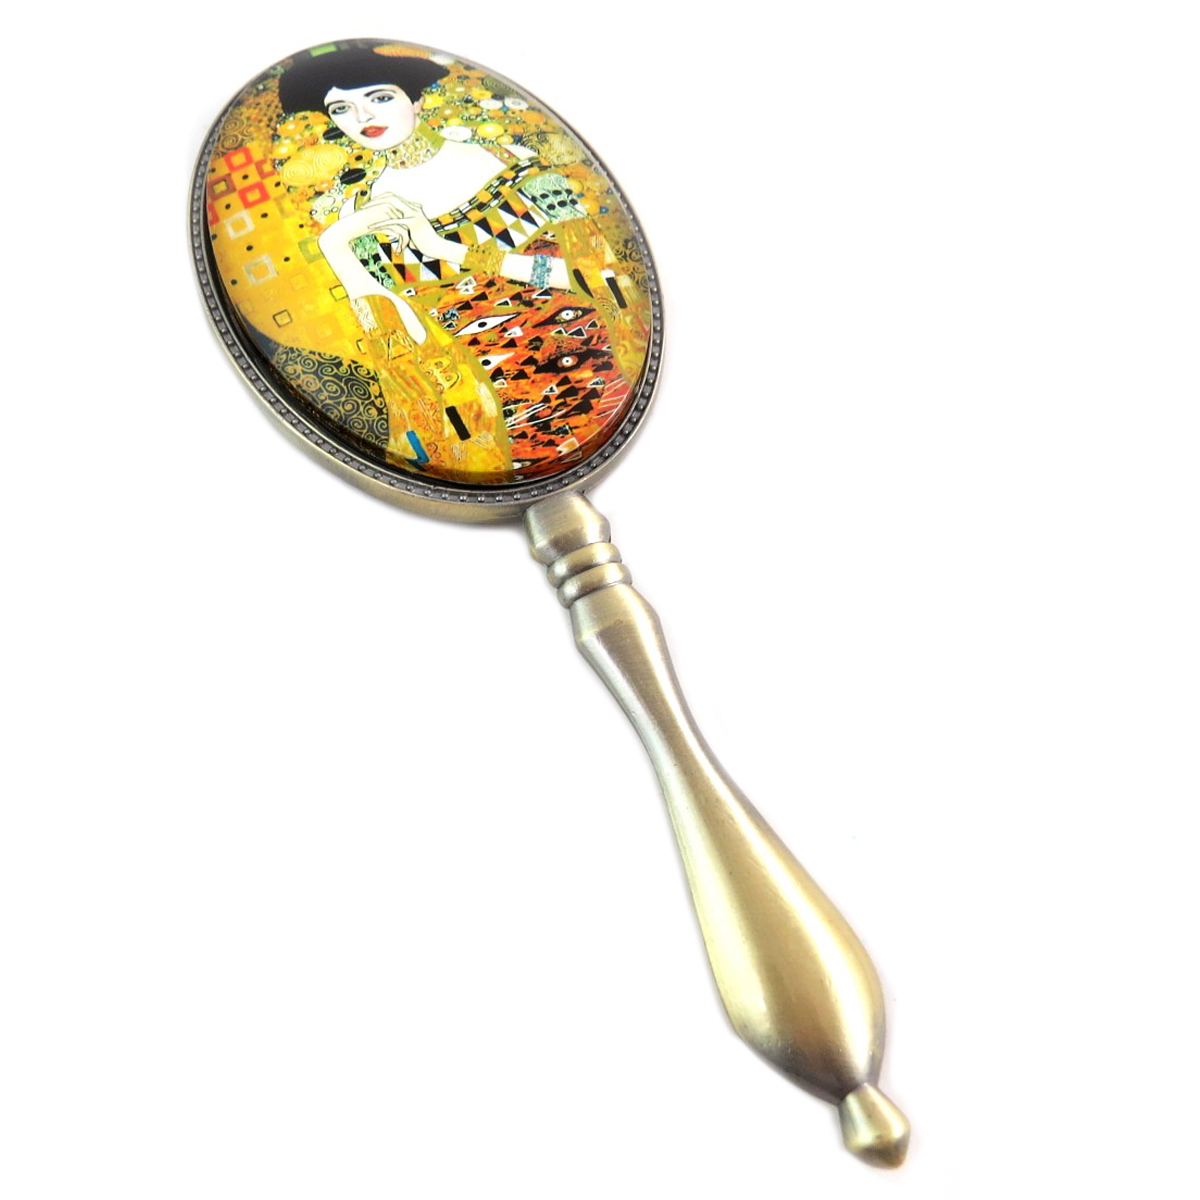 Miroir à main \'Gustav Klimt\' (Adele) - 195x7x15 cm - [Q0253]